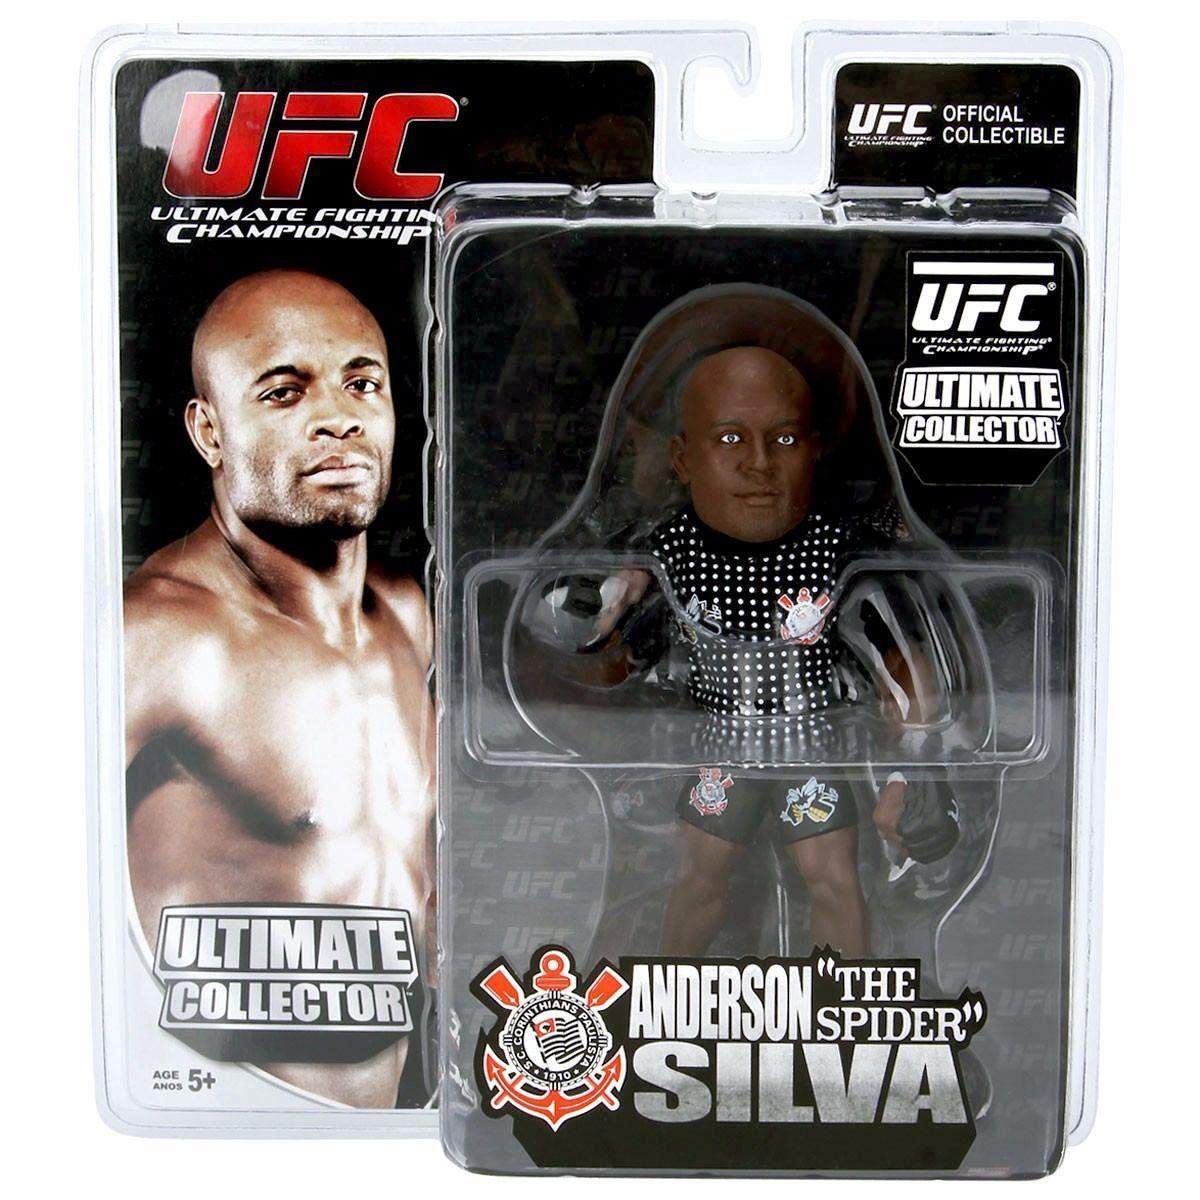 Boneco Anderson Silva (The Spider): UFC Ultimate Collector